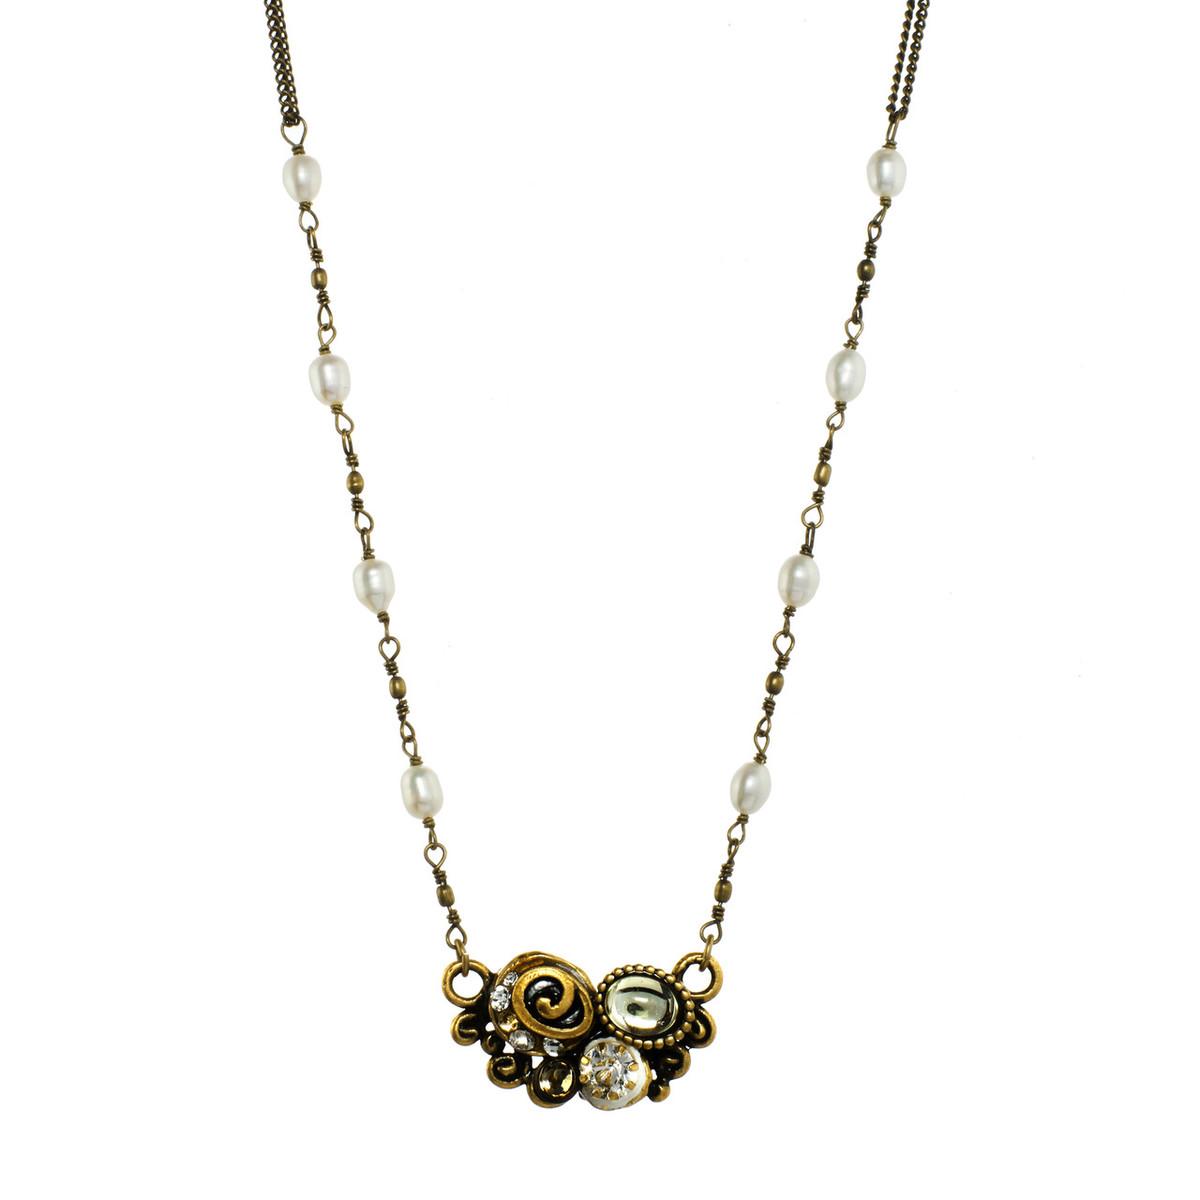 Orange Swirl Pendant necklace from Michal Golan Jewelry